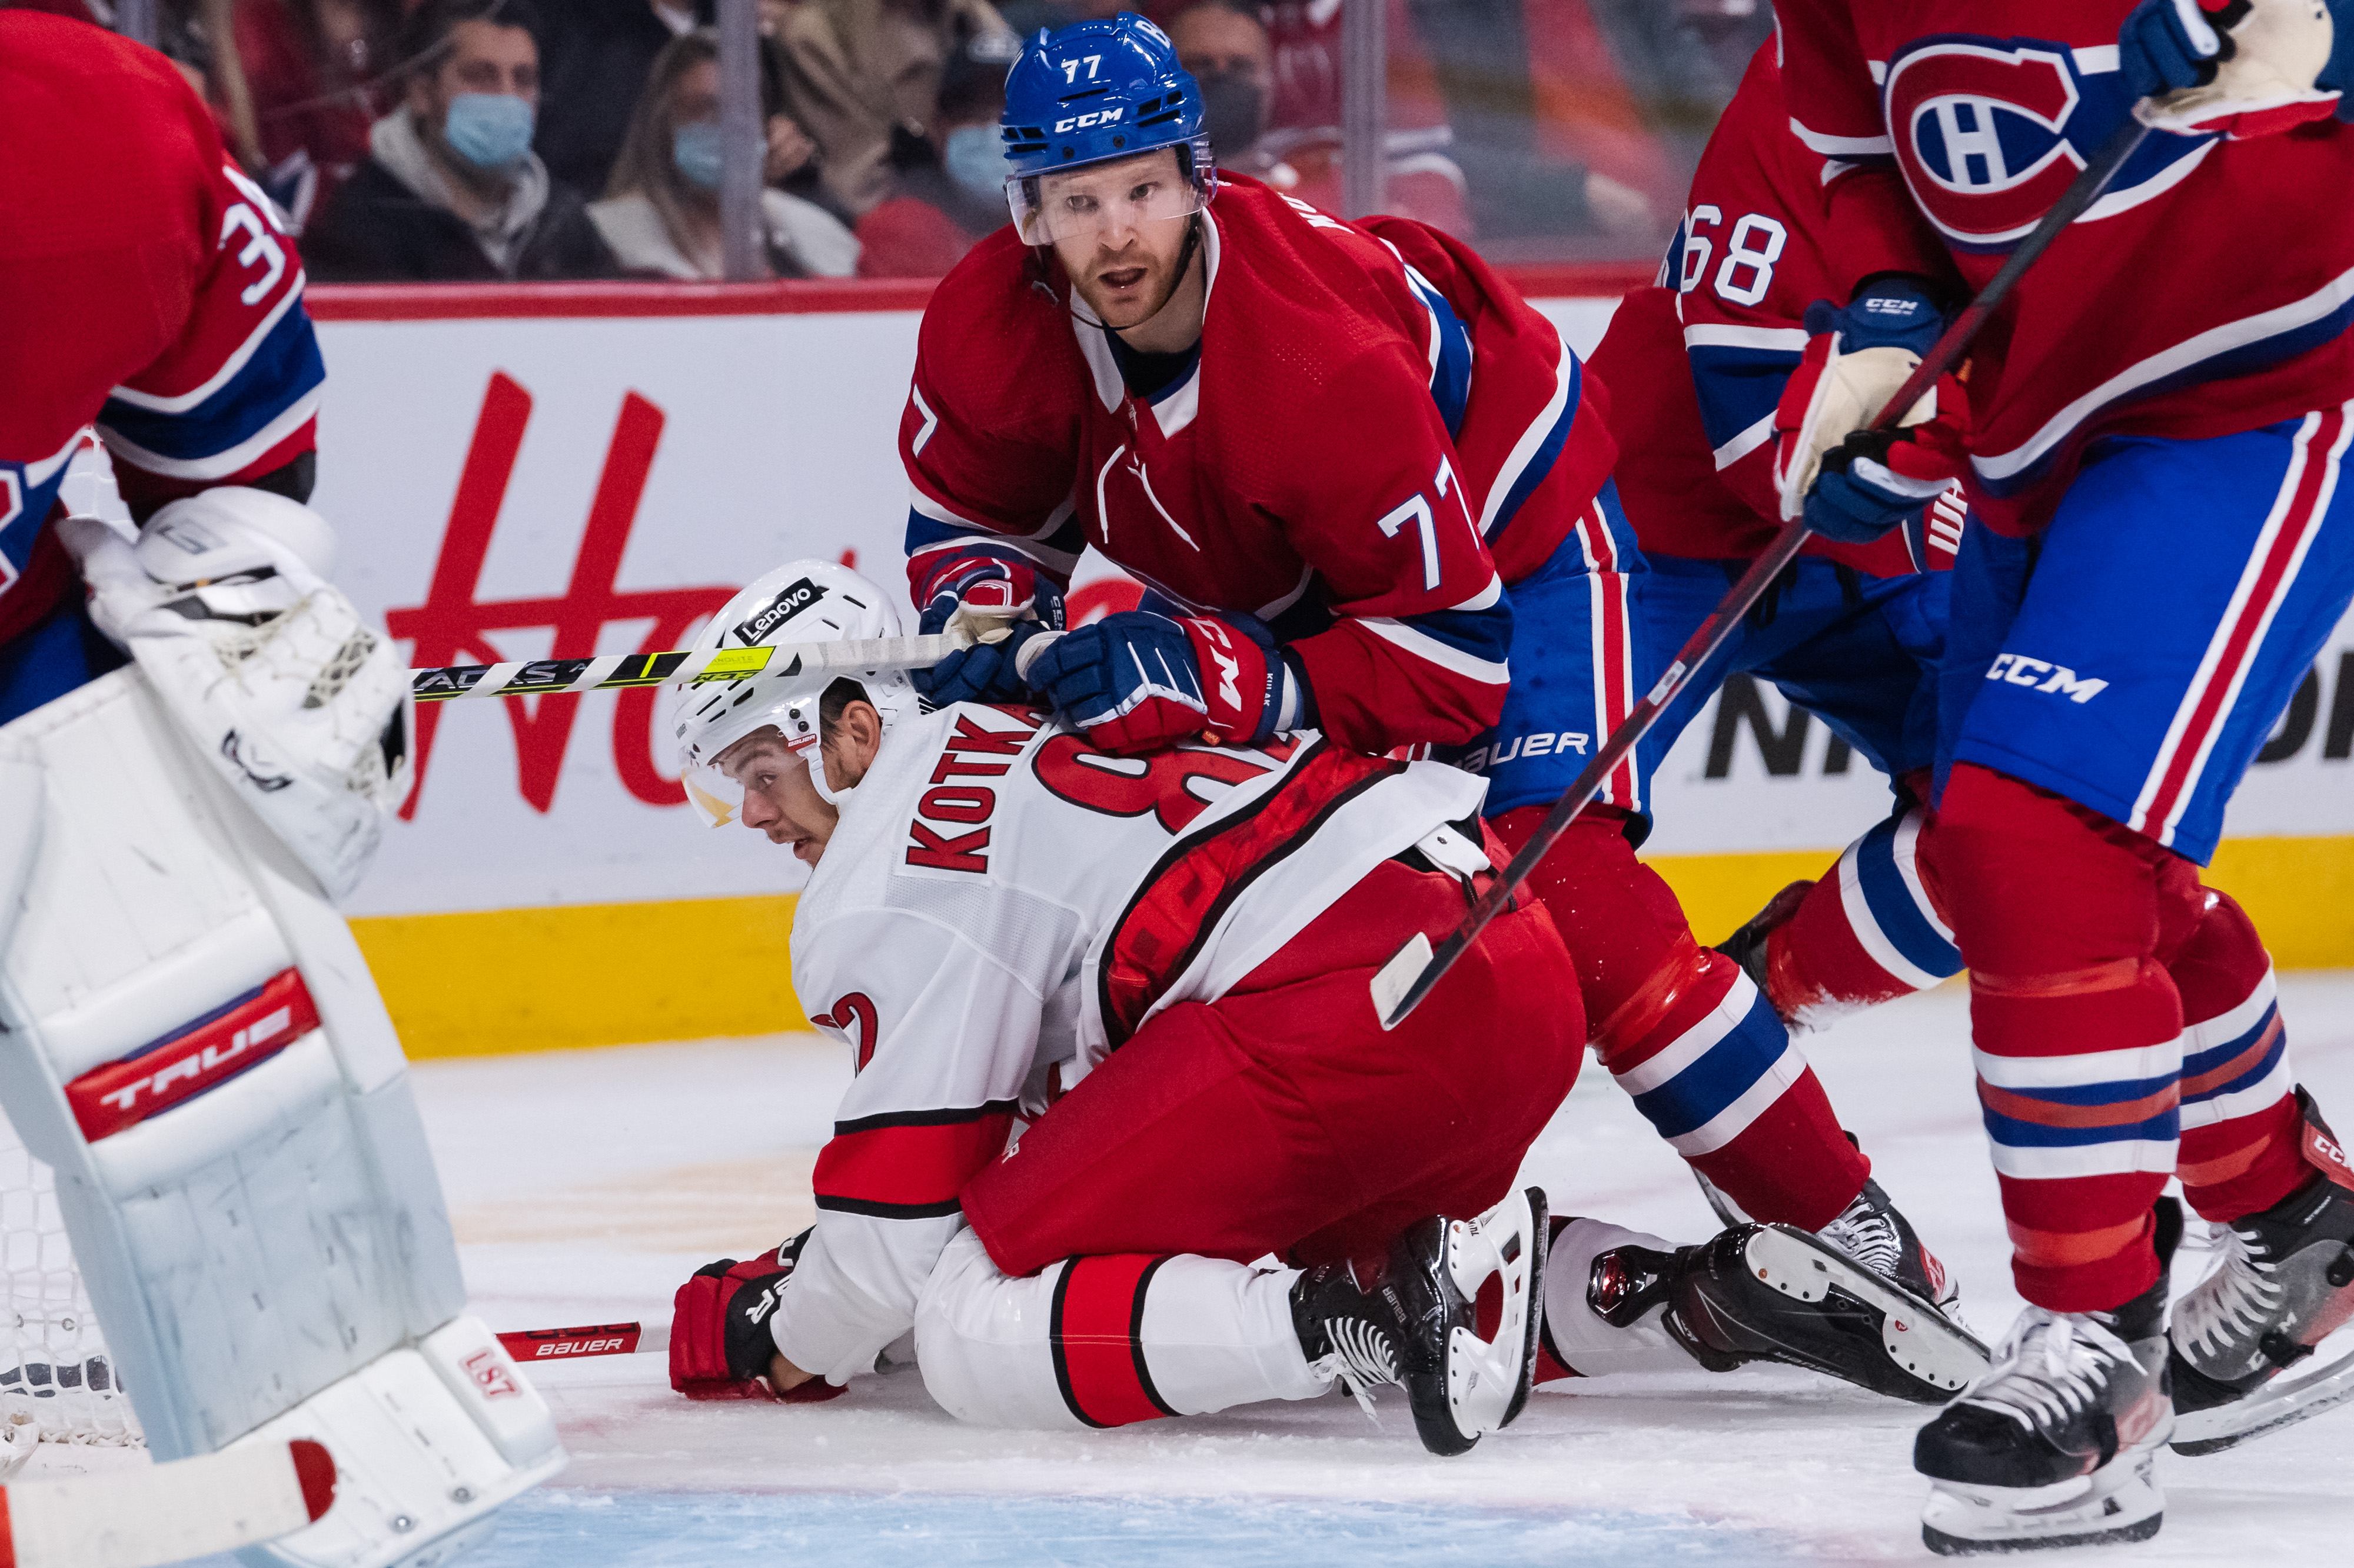 NHL: OCT 21 Hurricanes at Canadiens